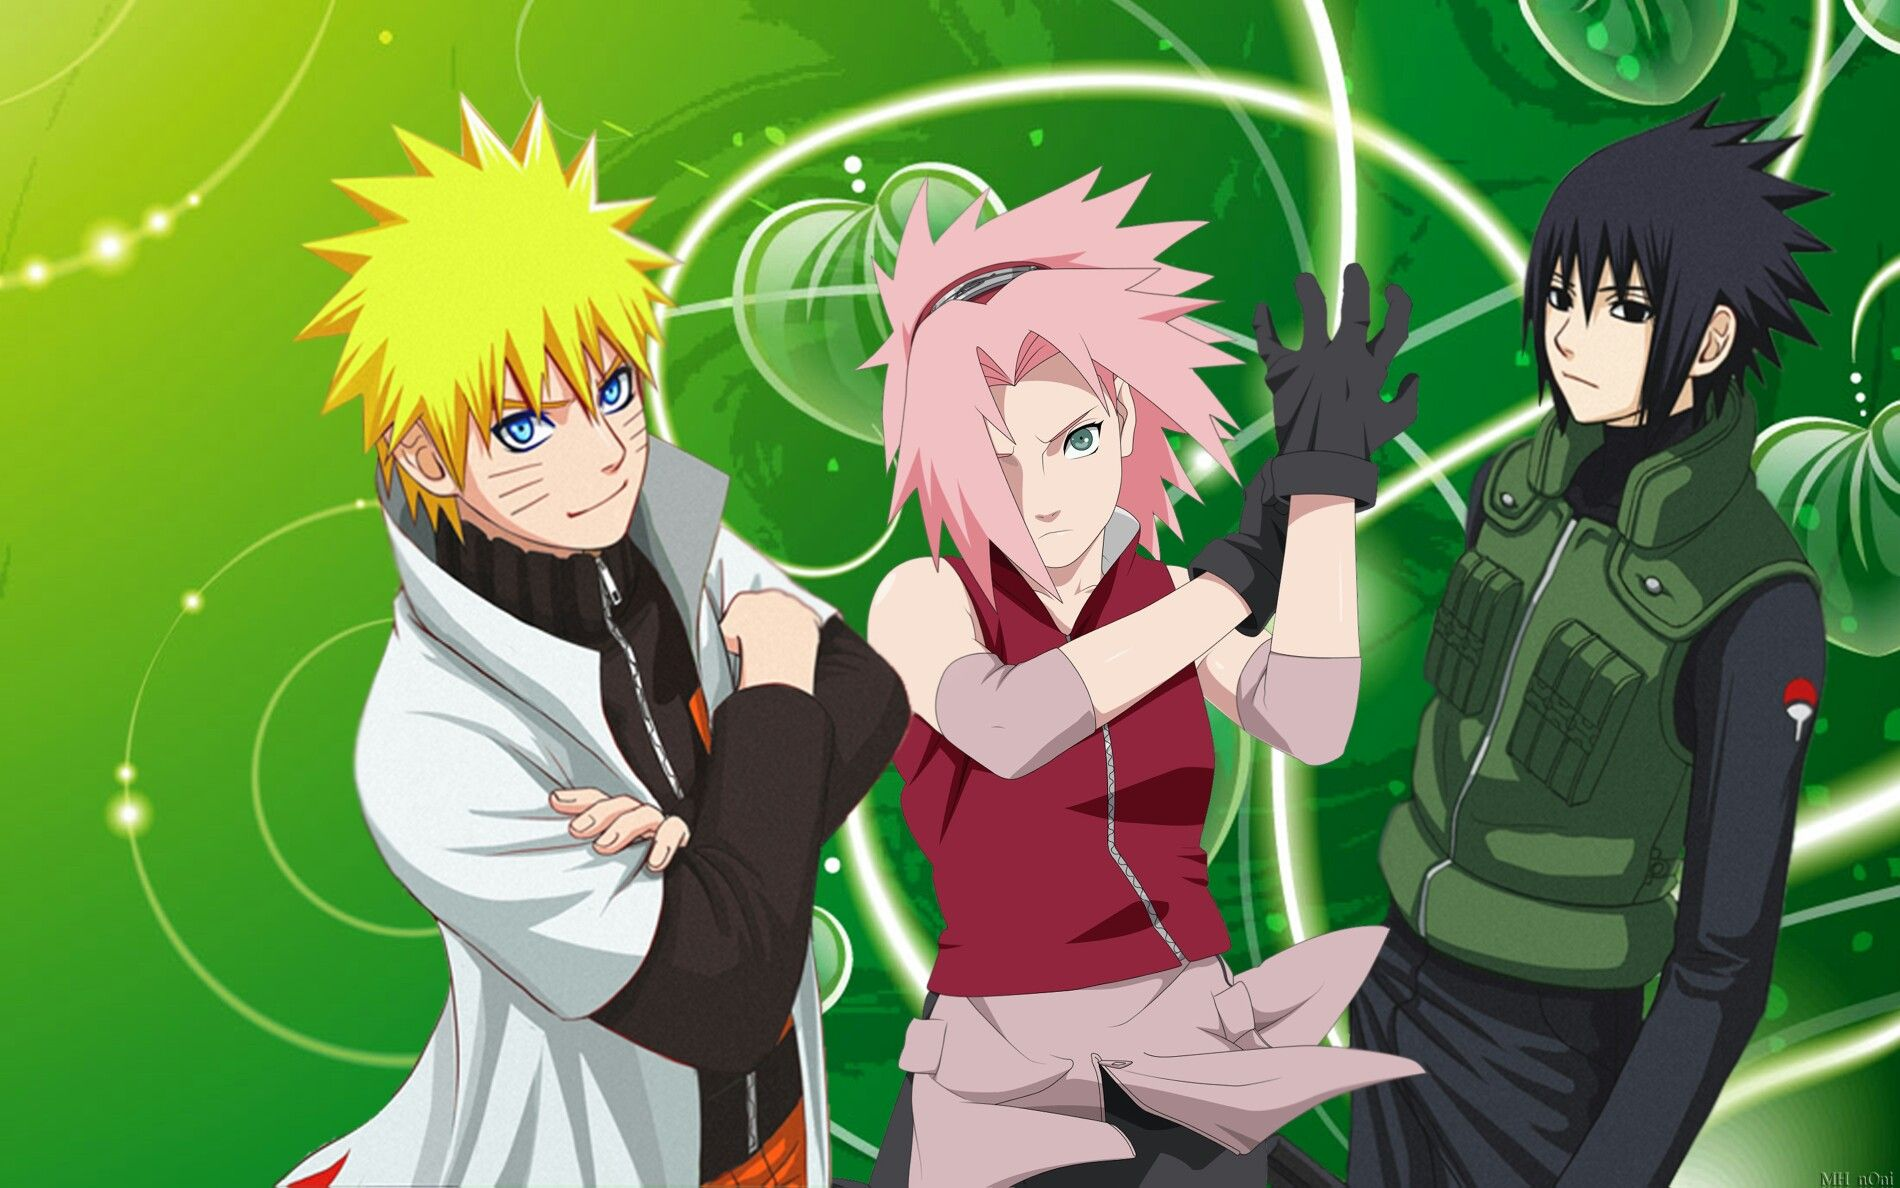 Must see Wallpaper Naruto Team 7 - 5a3d00b24e0e470ff2d660b49b67098a  Pictures.jpg